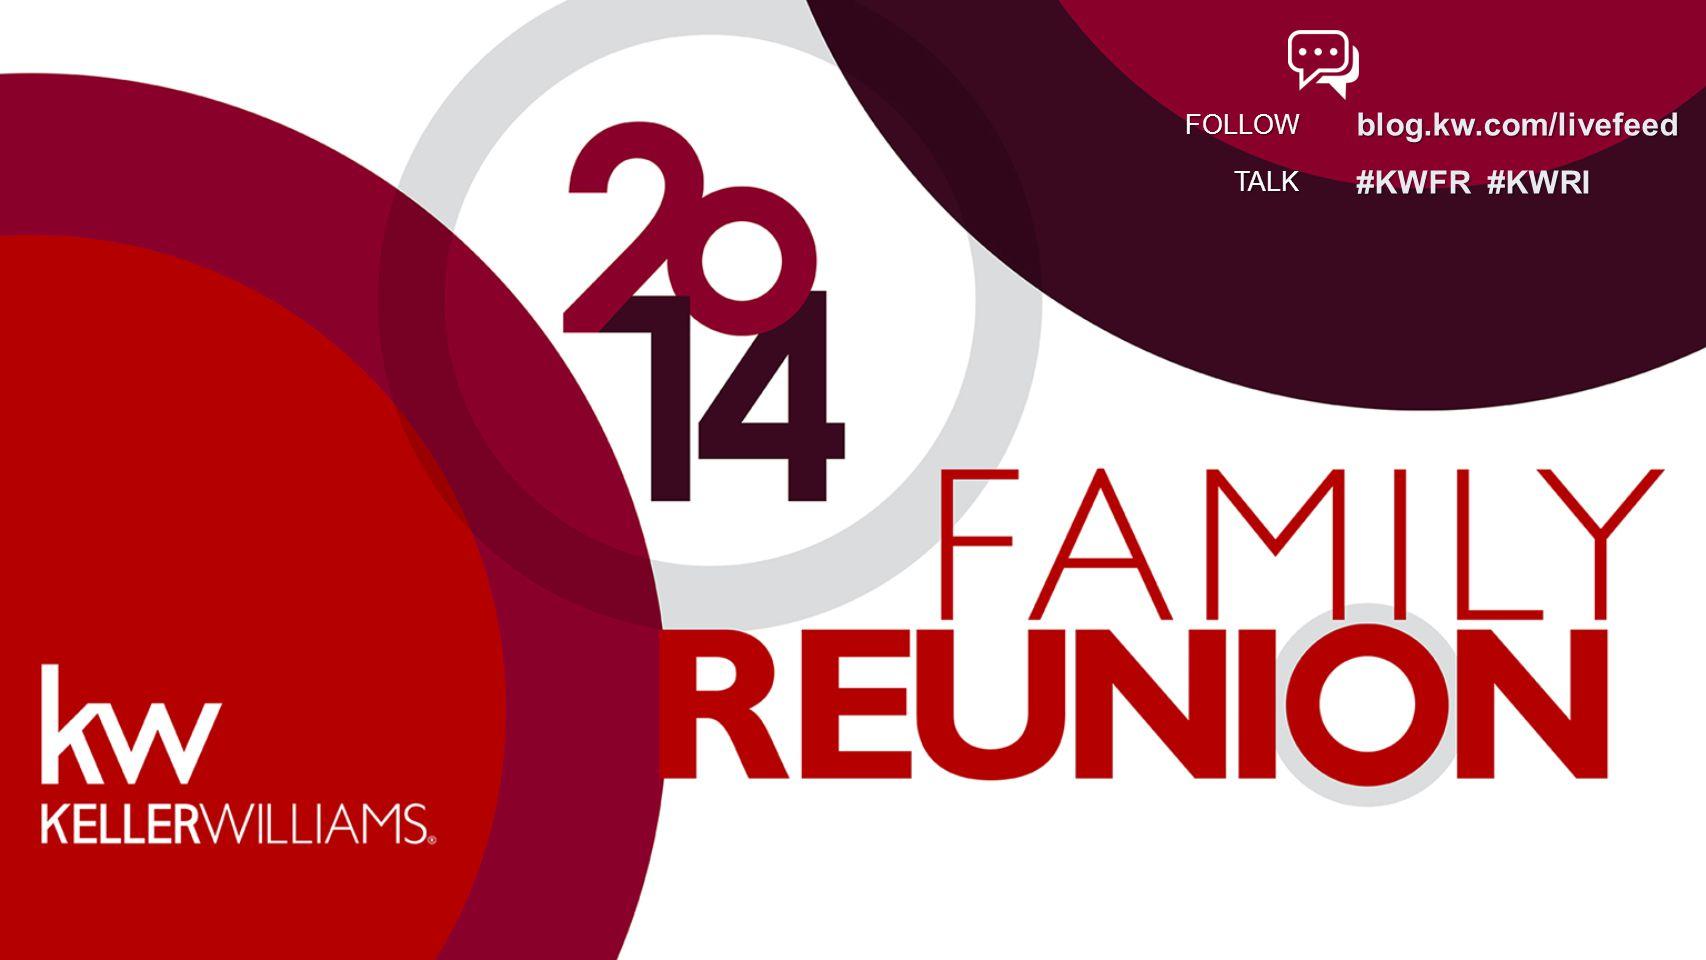 Keller Williams Family Reunion 2014